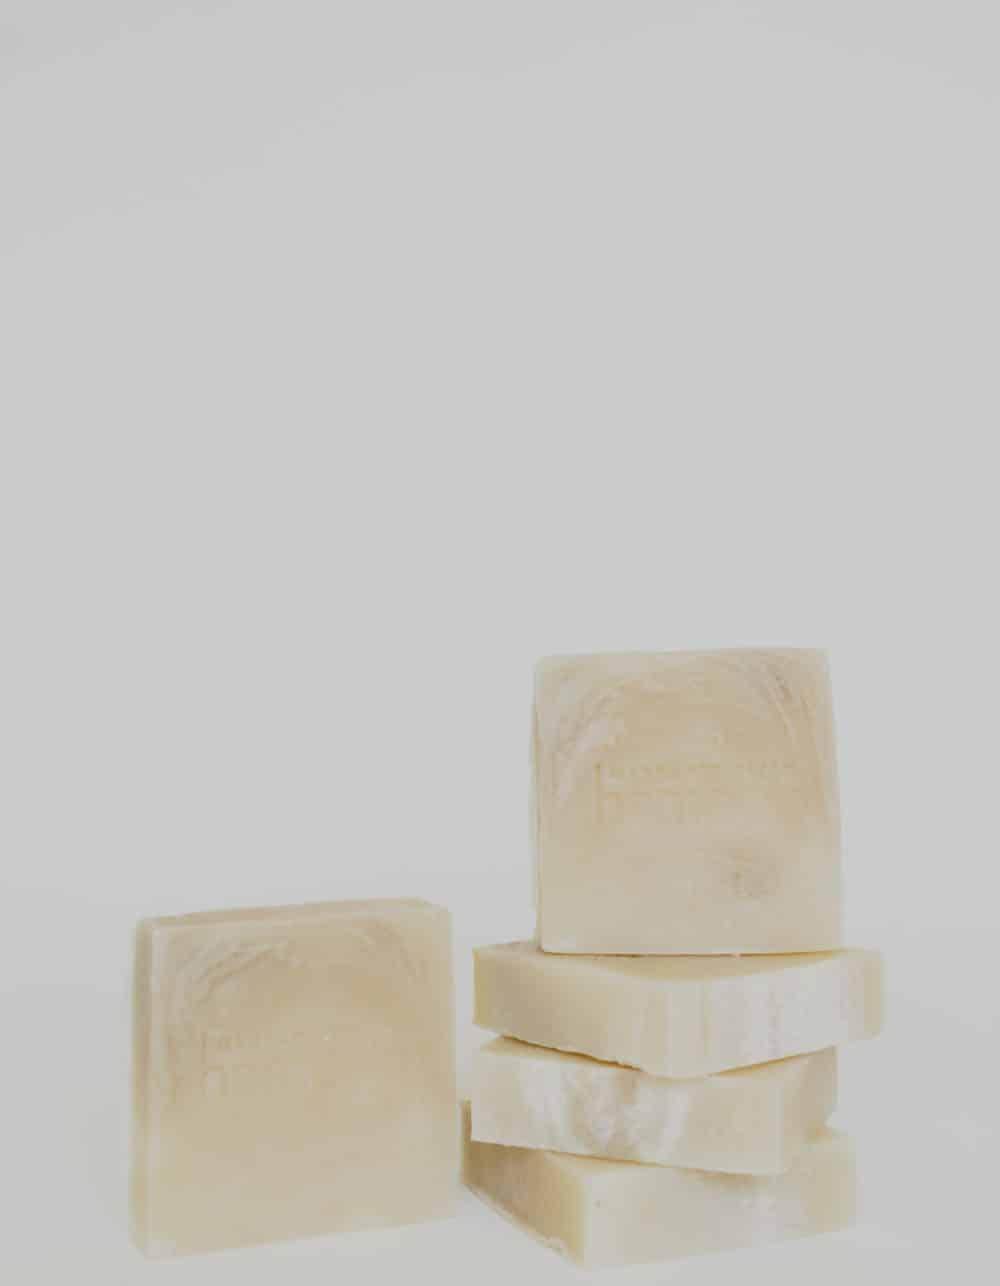 Organic Hemp Soap Bar - West Indian Lime & Rose Geranium